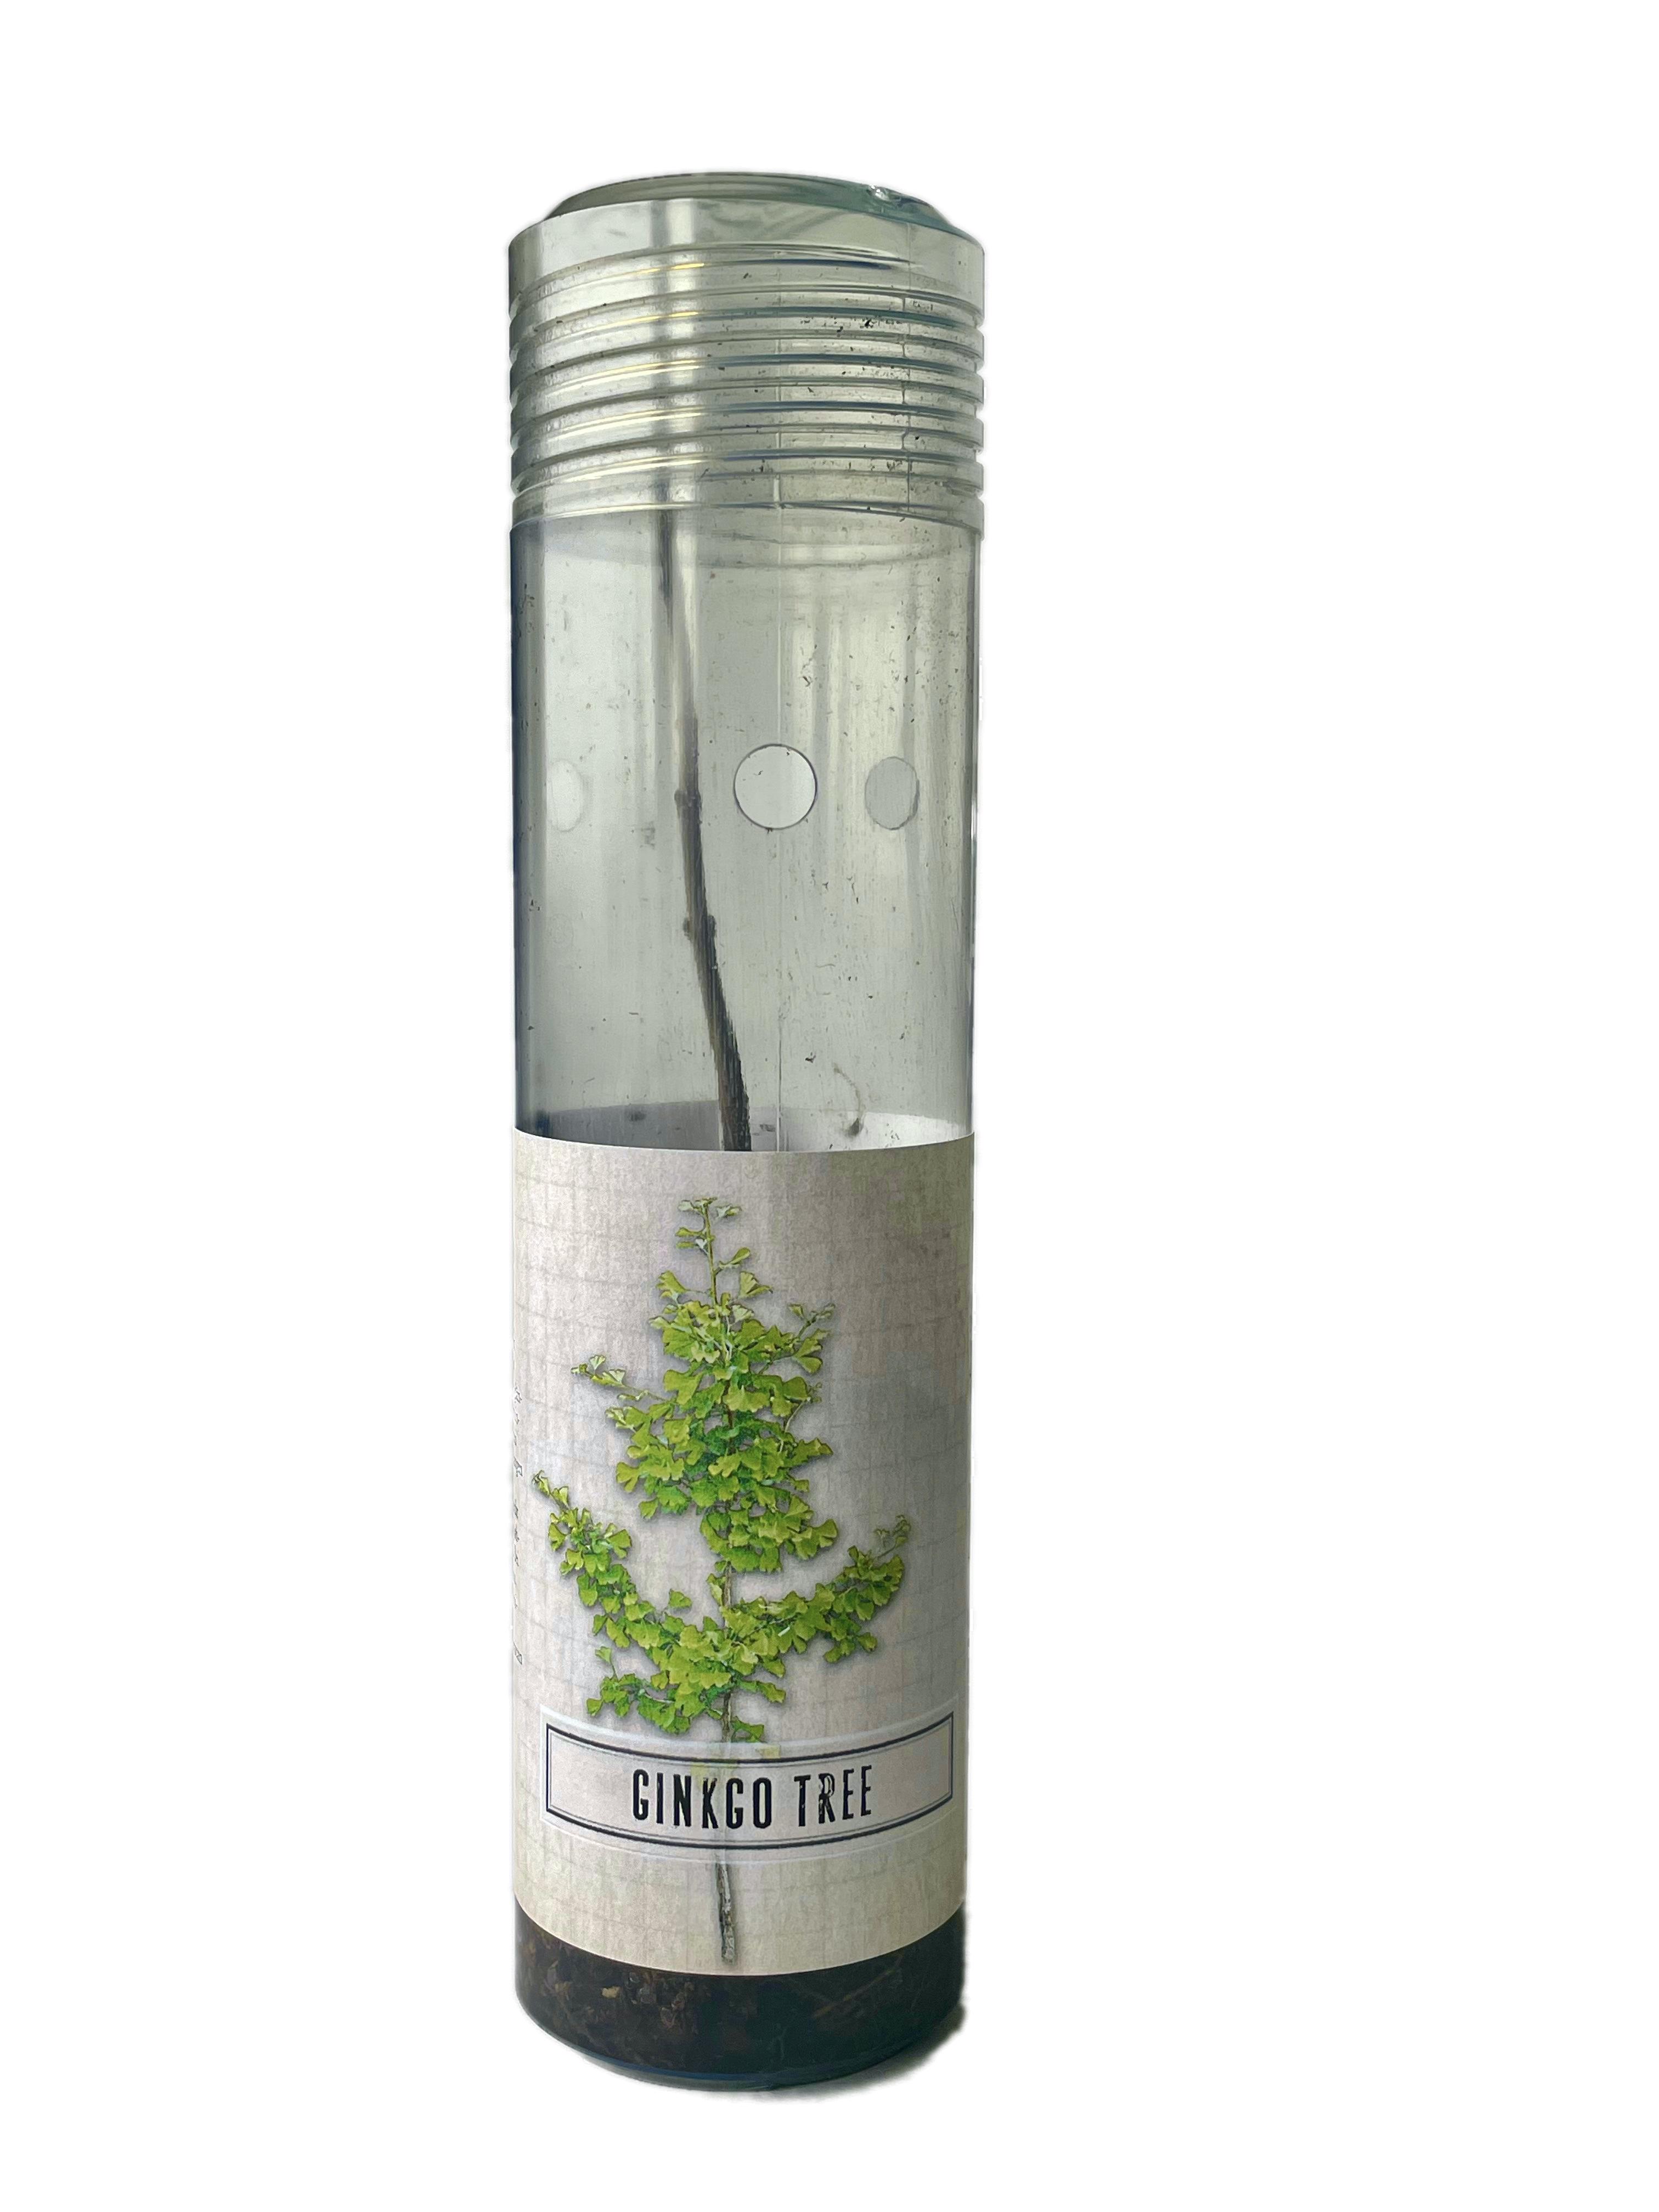 Ginkgo Tree: